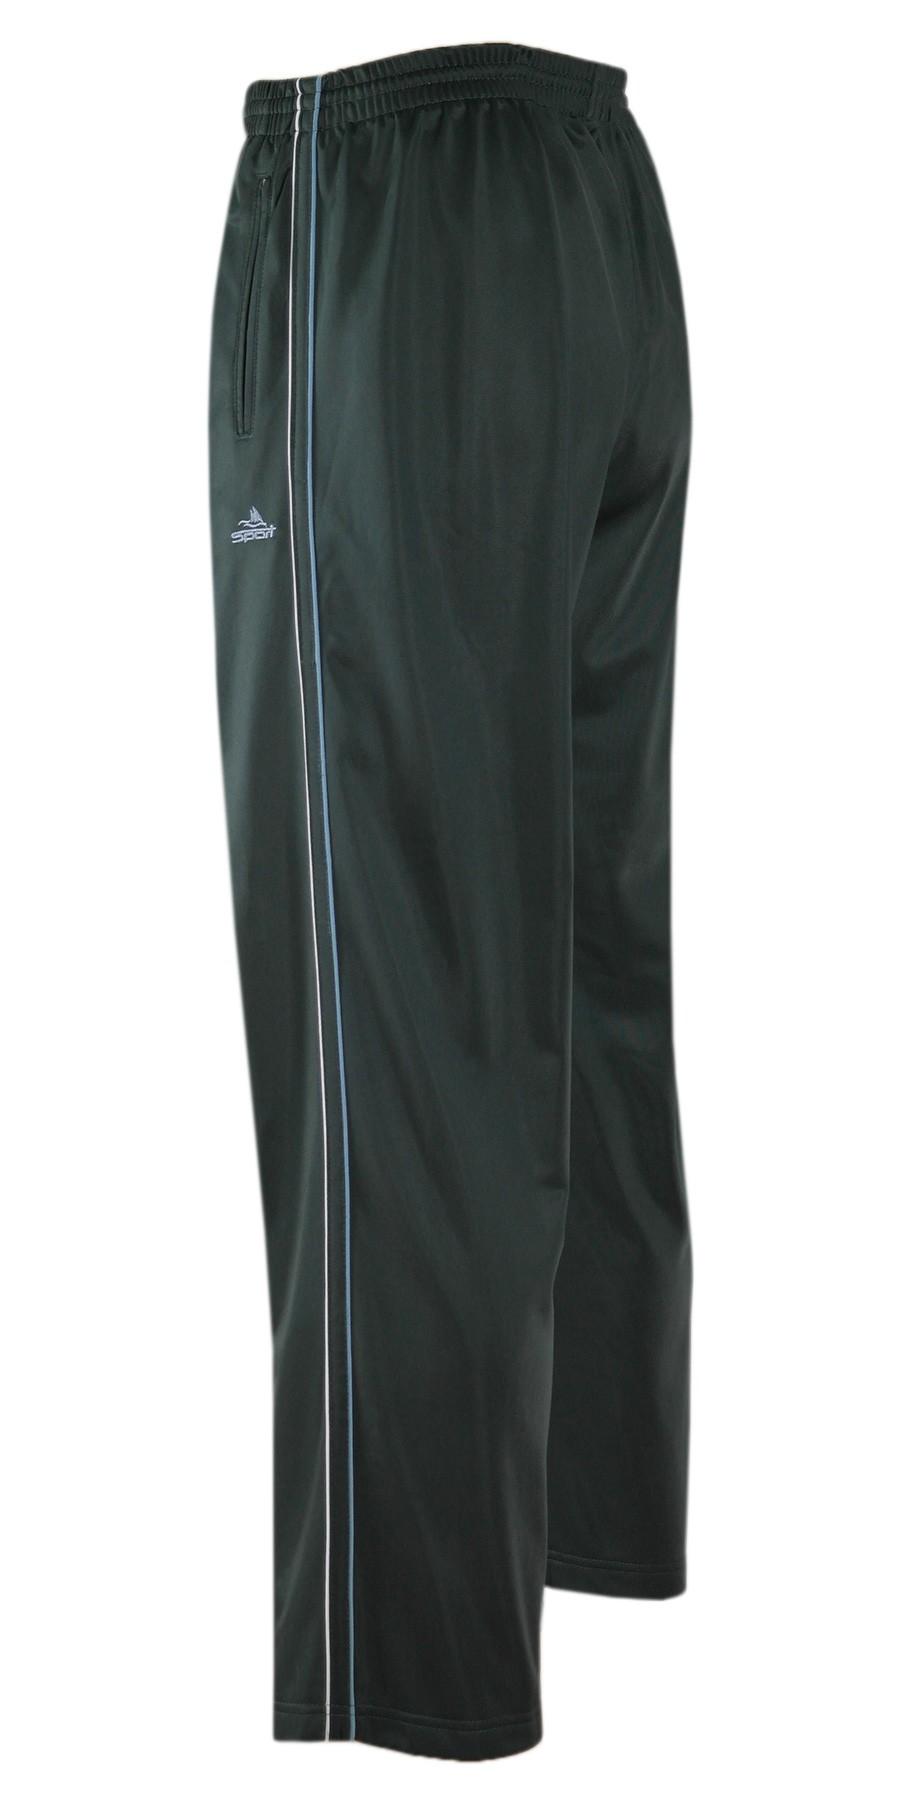 Jogginghose, Sport- Freizeithose offener Saum K-Größen - Grau